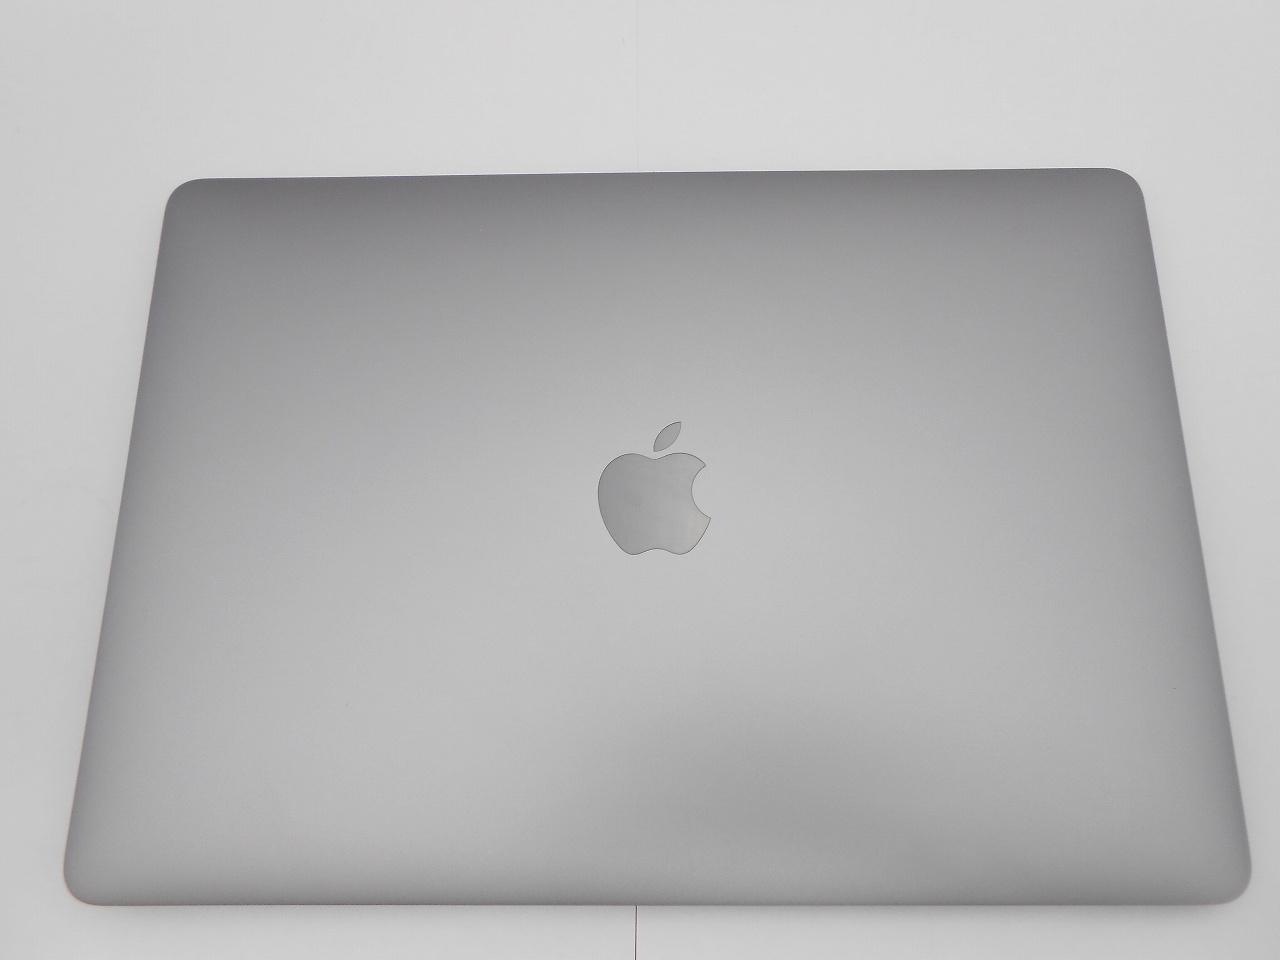 Aランク【中古】 Apple MacBookPro MPXQ2J/A/Mid2017/Corei5 2.3GHz/メモリ8GB/SSD128GB/13インチ/Mac OS Catalina10.15.5【3ヶ月保証】【足立店発送】